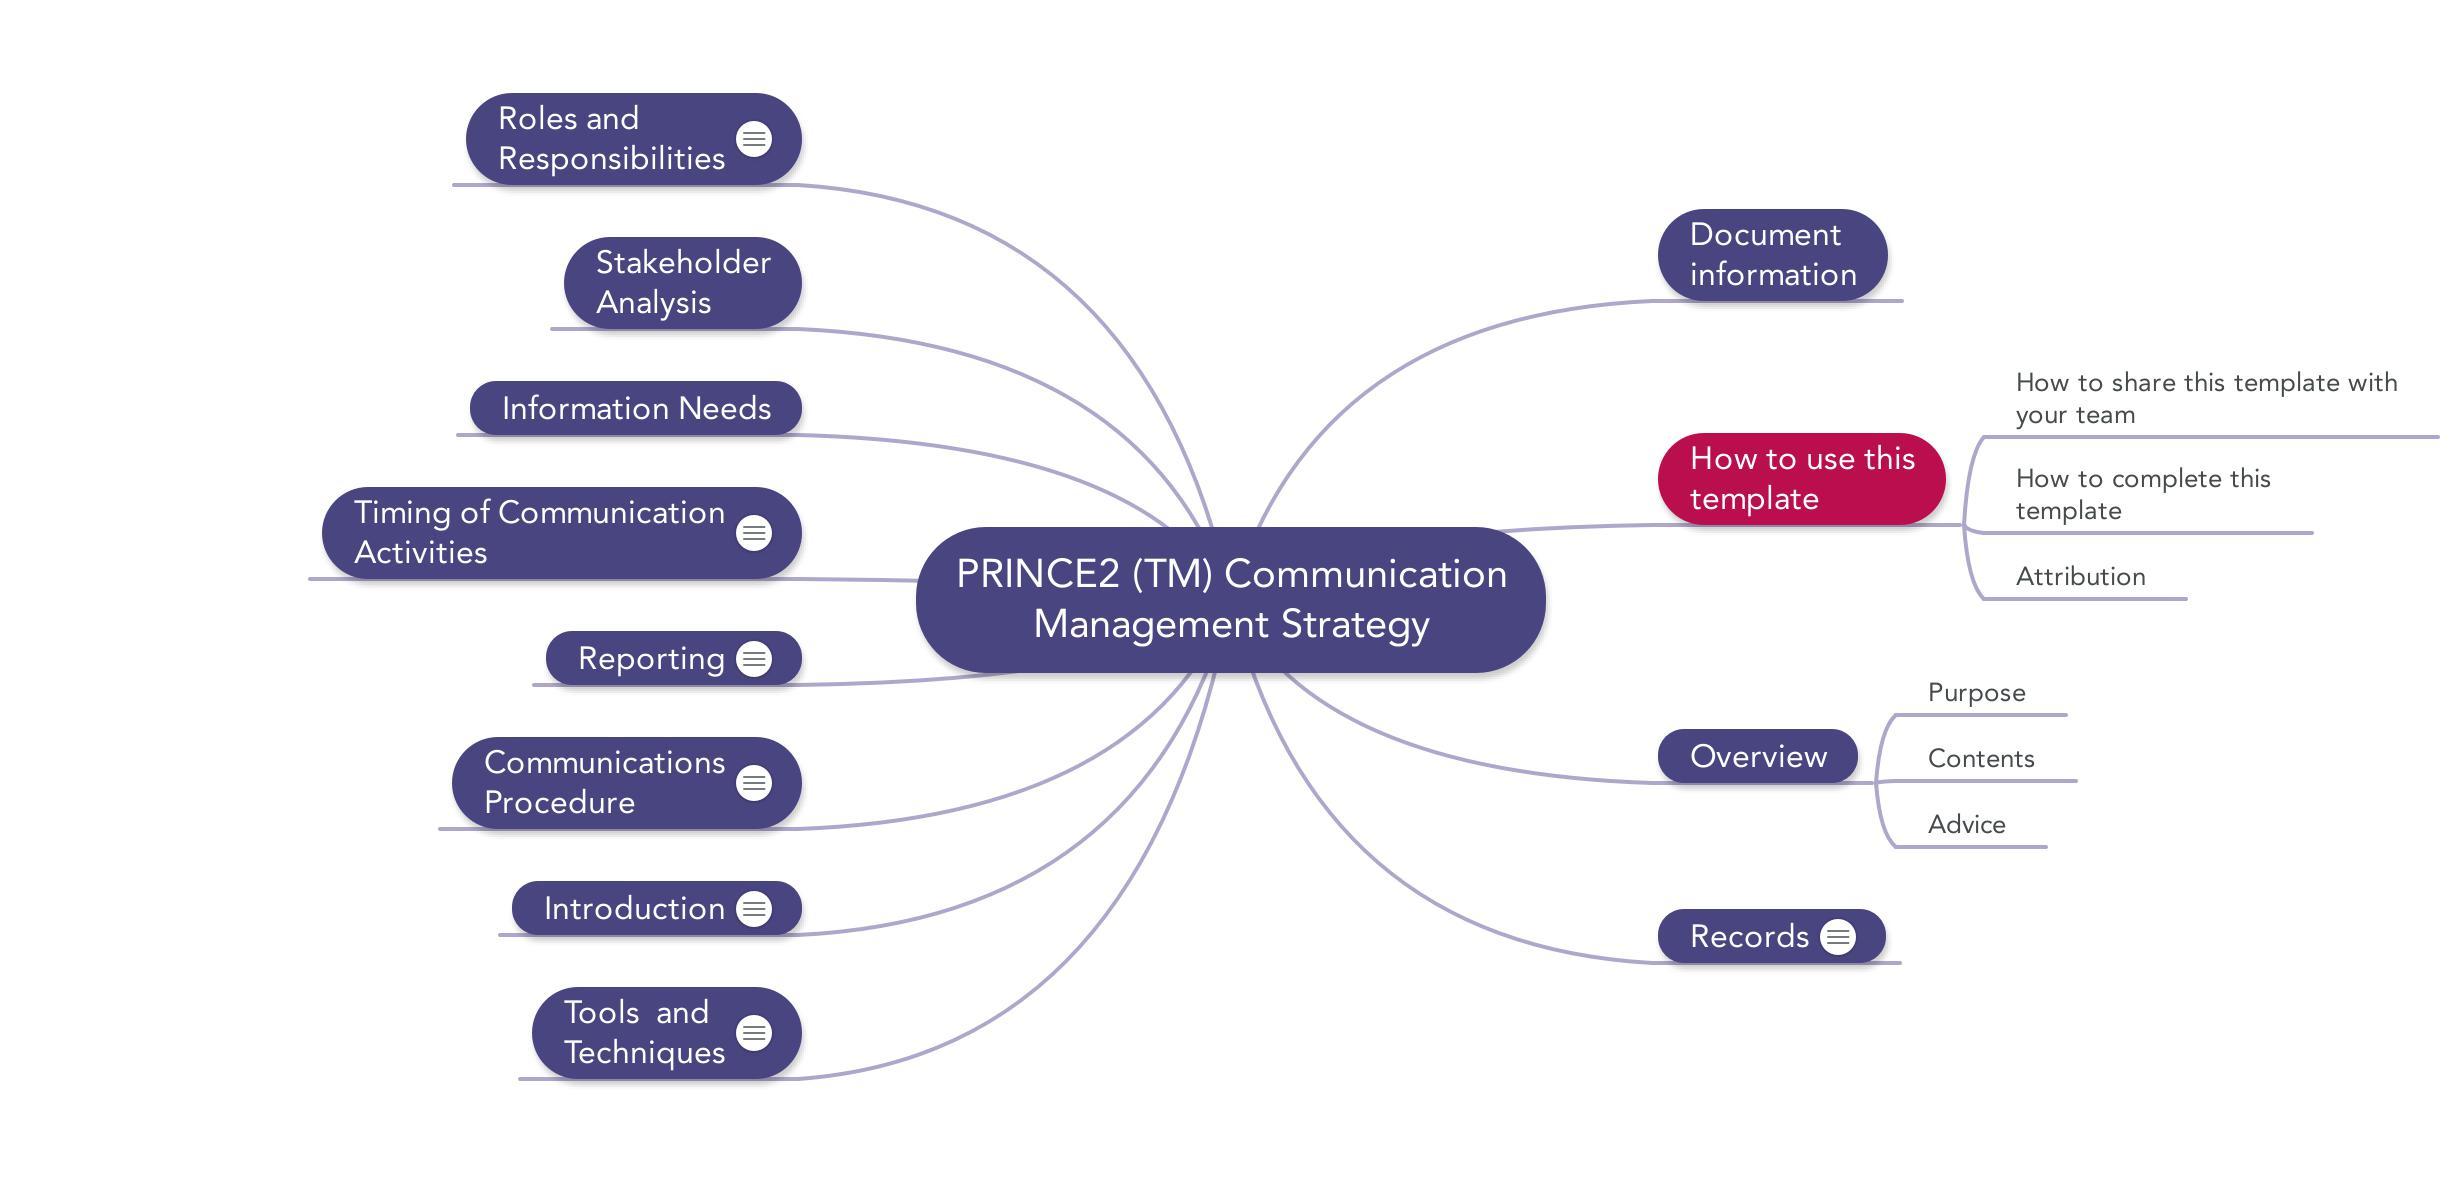 prince2 templates